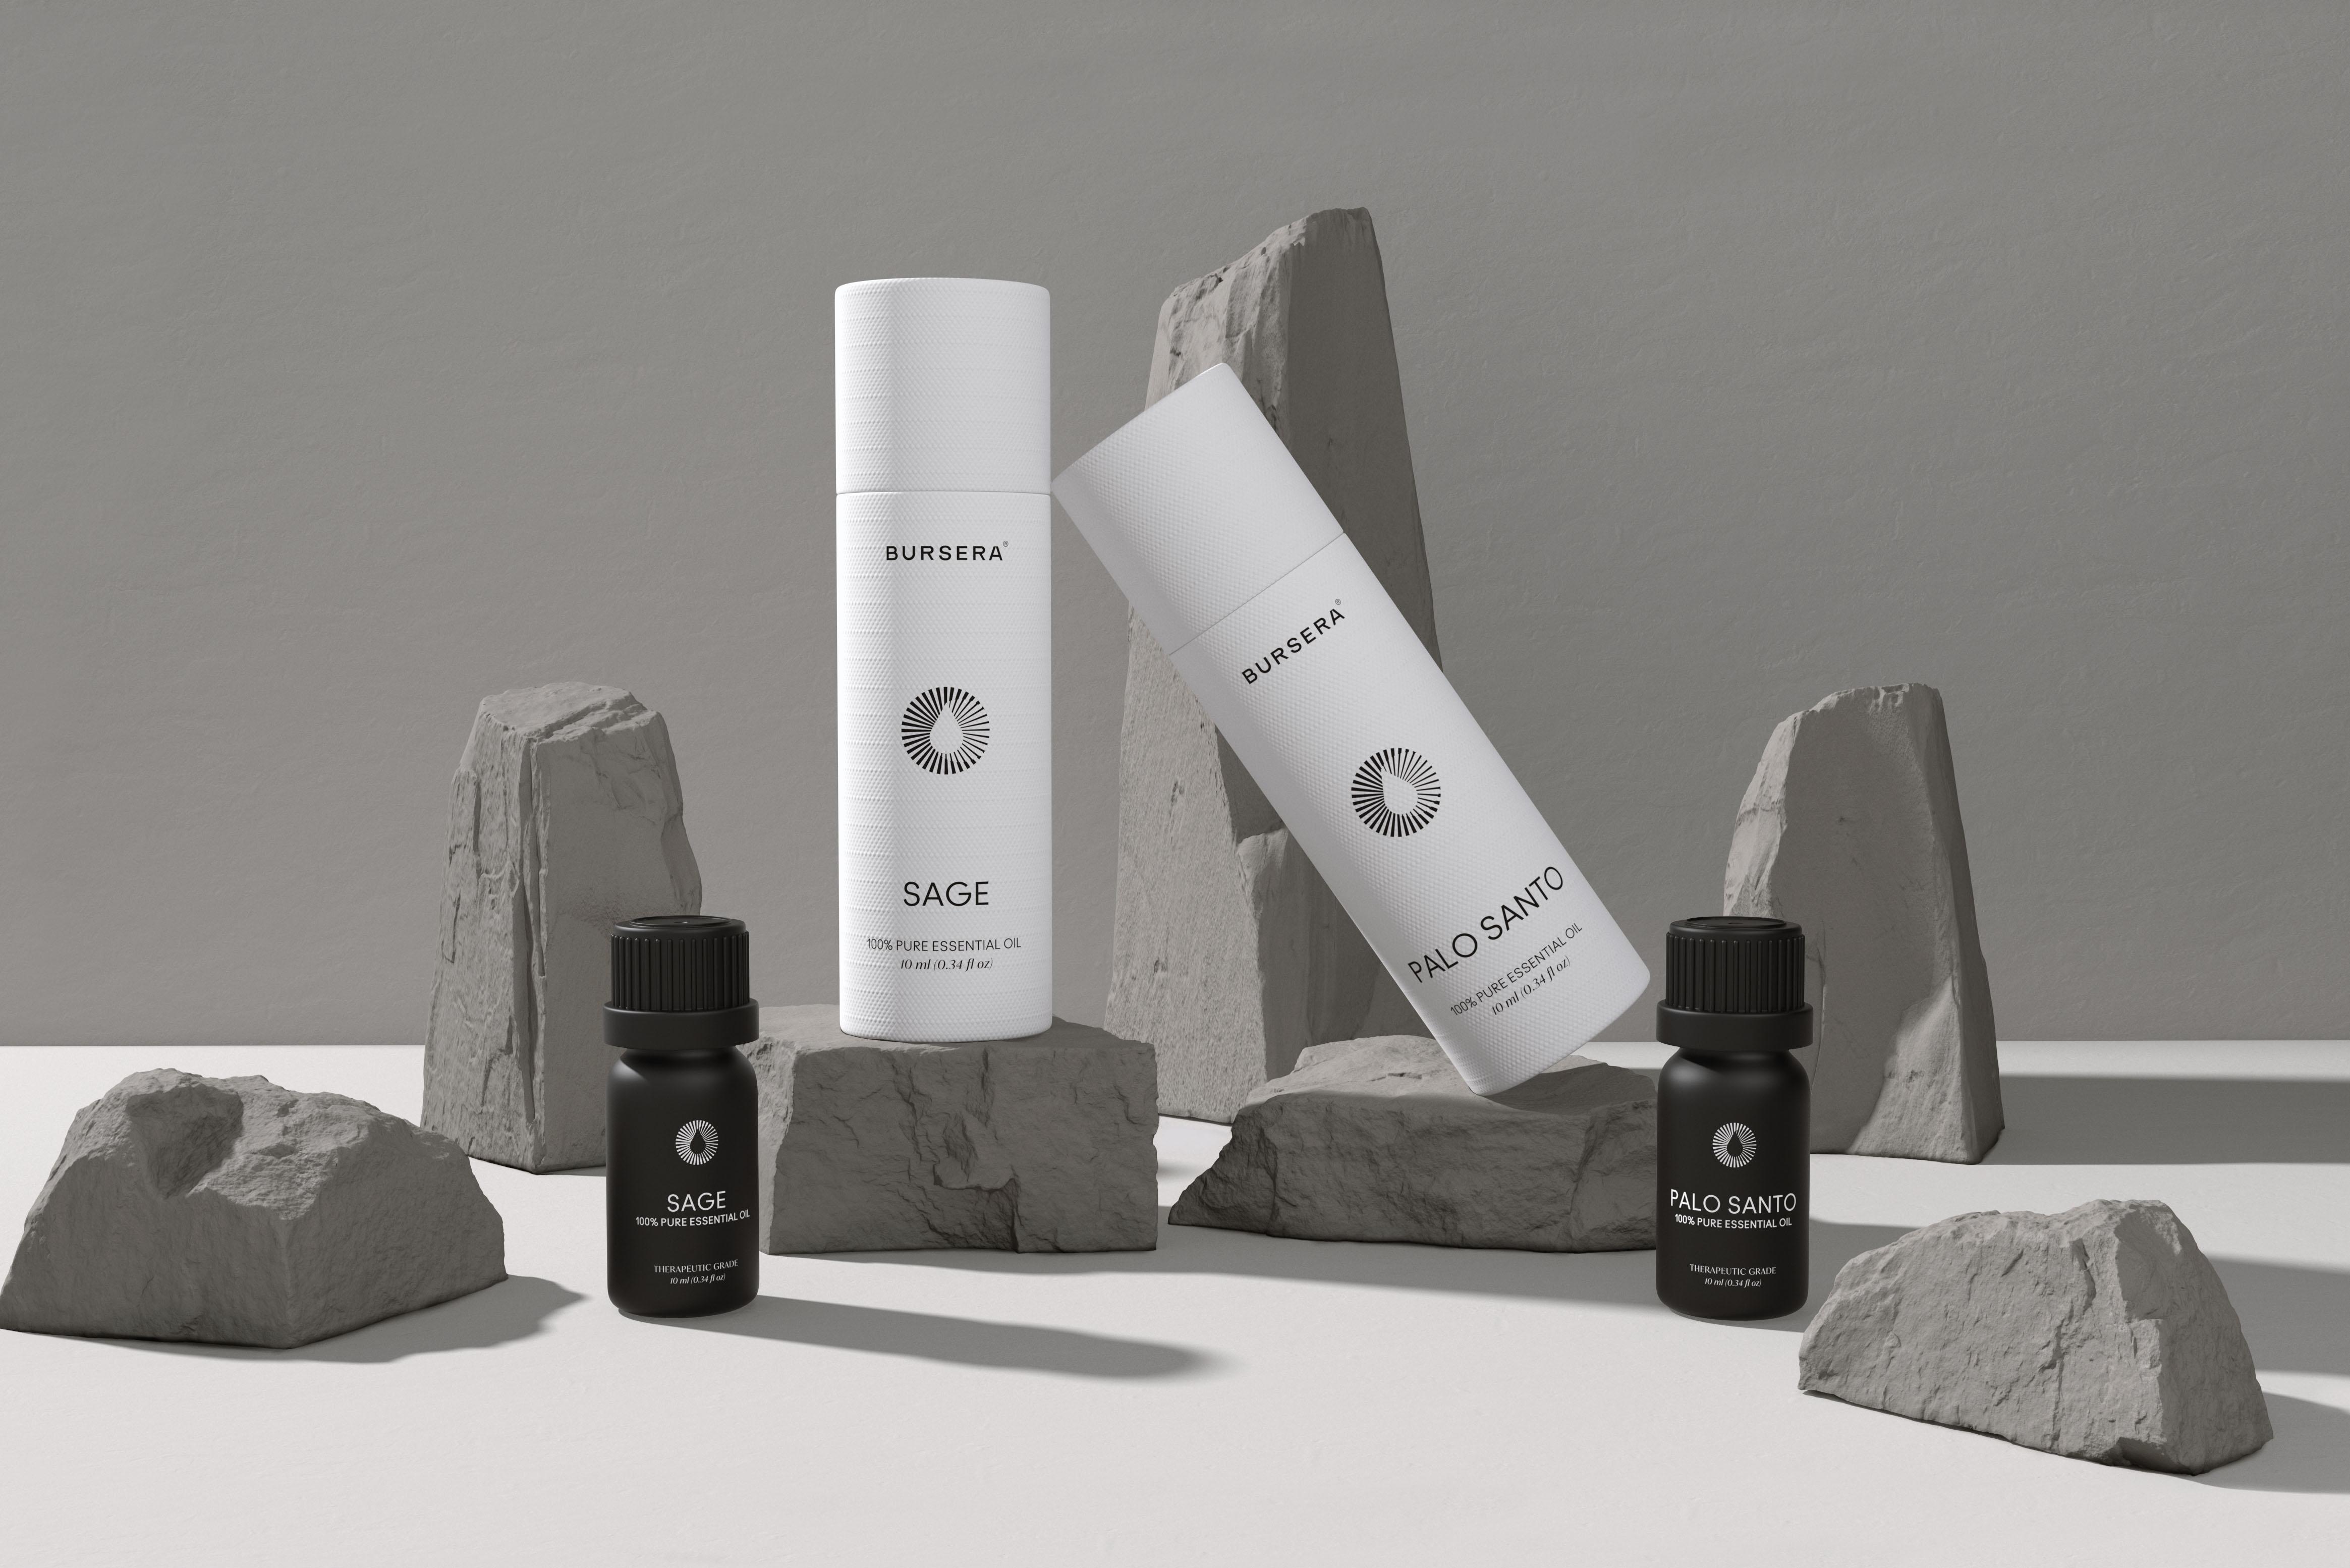 Bursera Aromatherapy Branding by Alejandro Gavancho